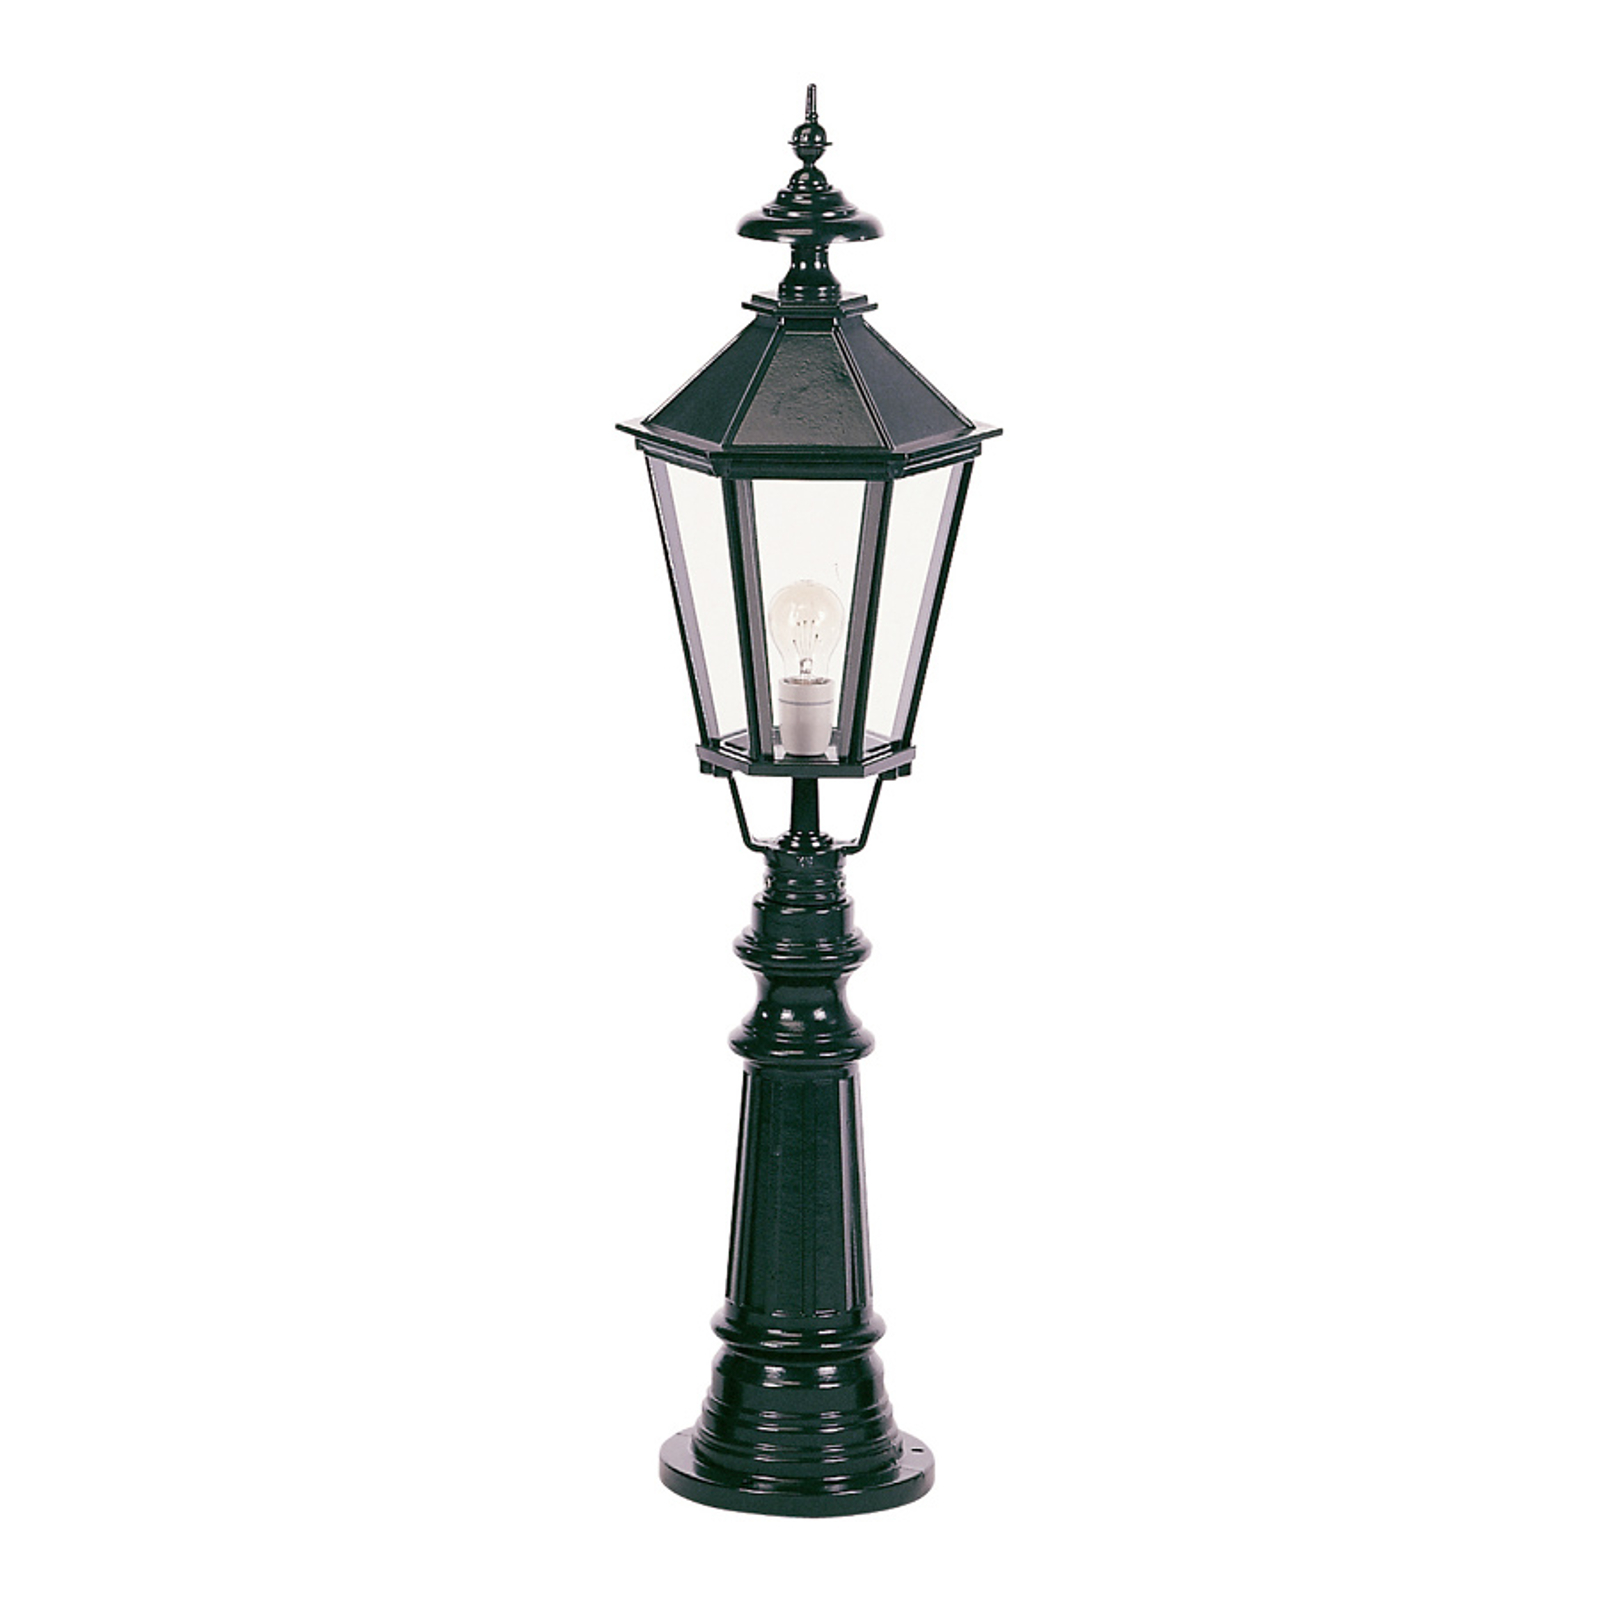 Klassieke tuinpadverlichting Liverpool, zwart